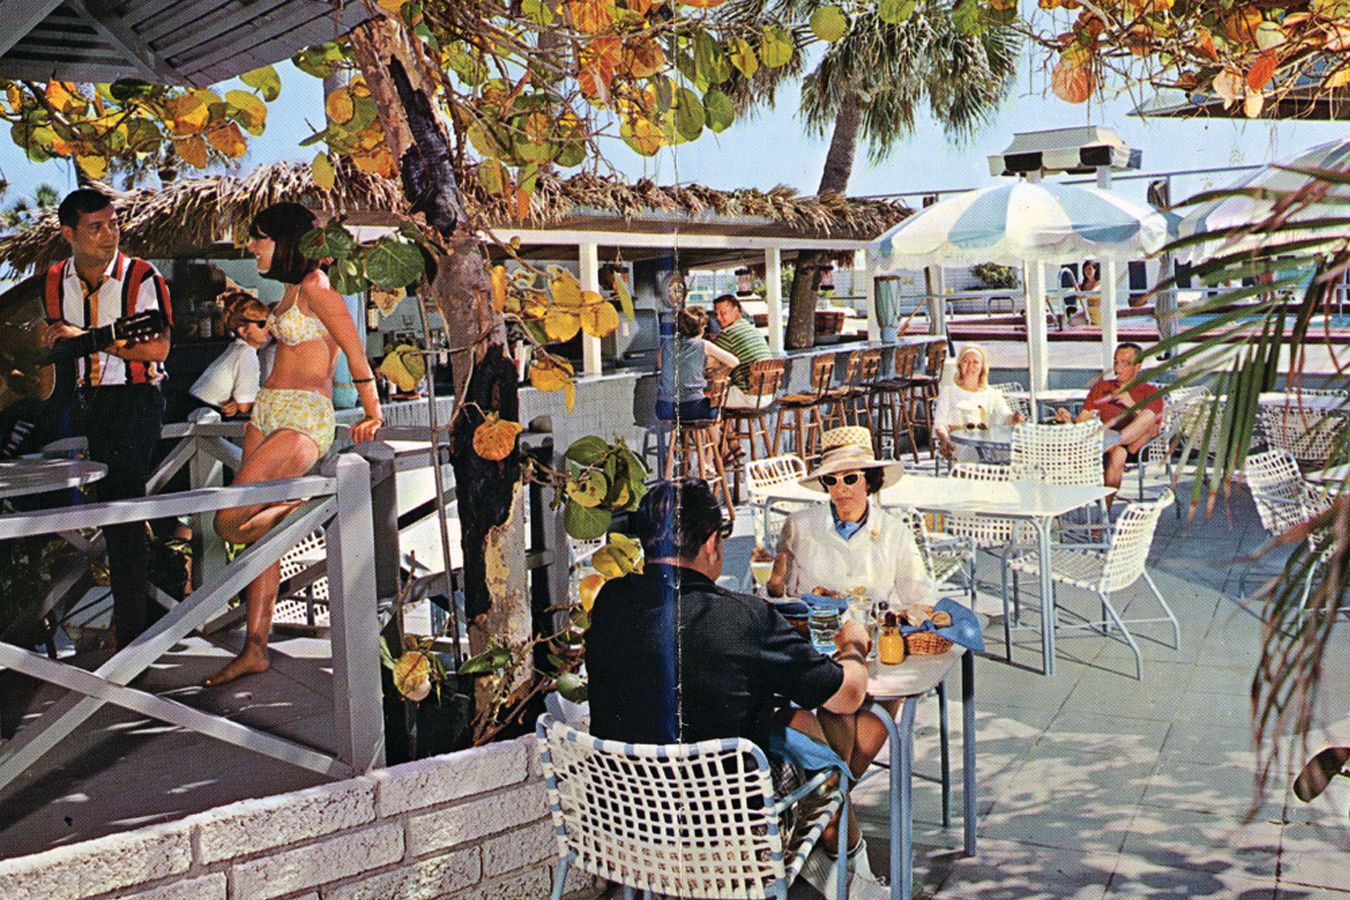 65e33dad9 Where to Eat and Drink on St. Armands/Longboat Key | Sarasota Magazine